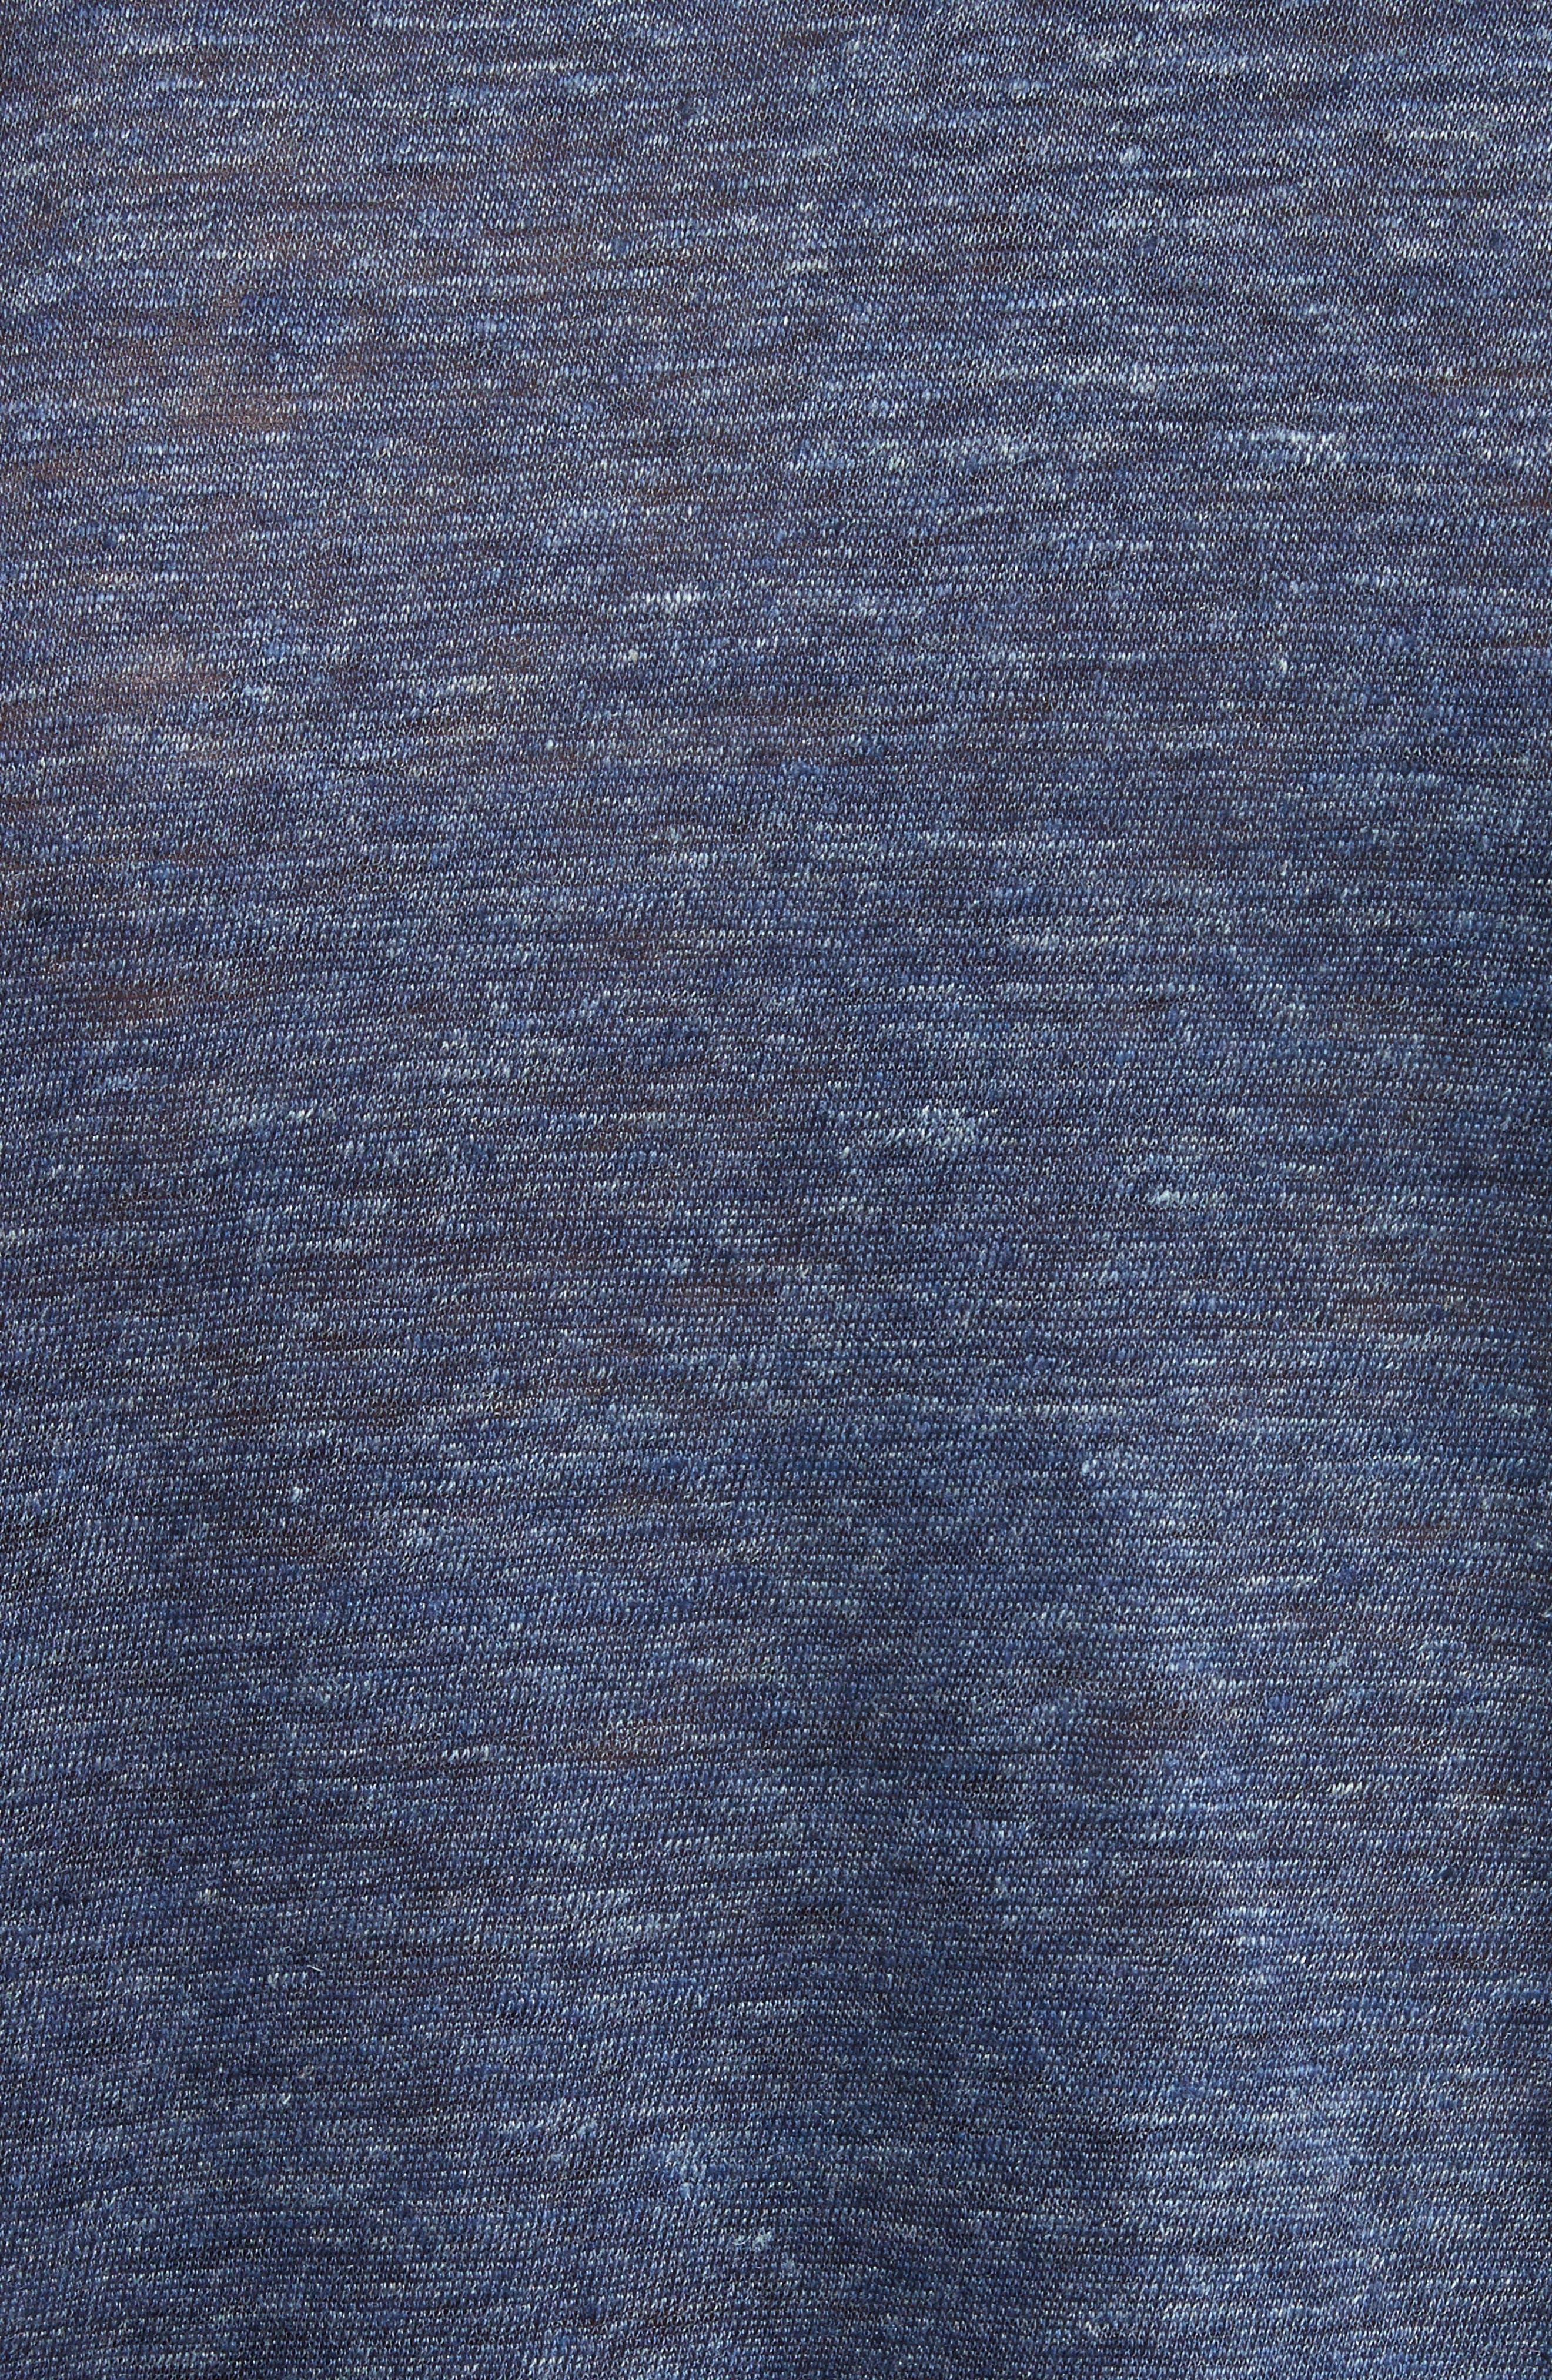 Alternate Image 5  - John Varvatos Collection Linen T-Shirt